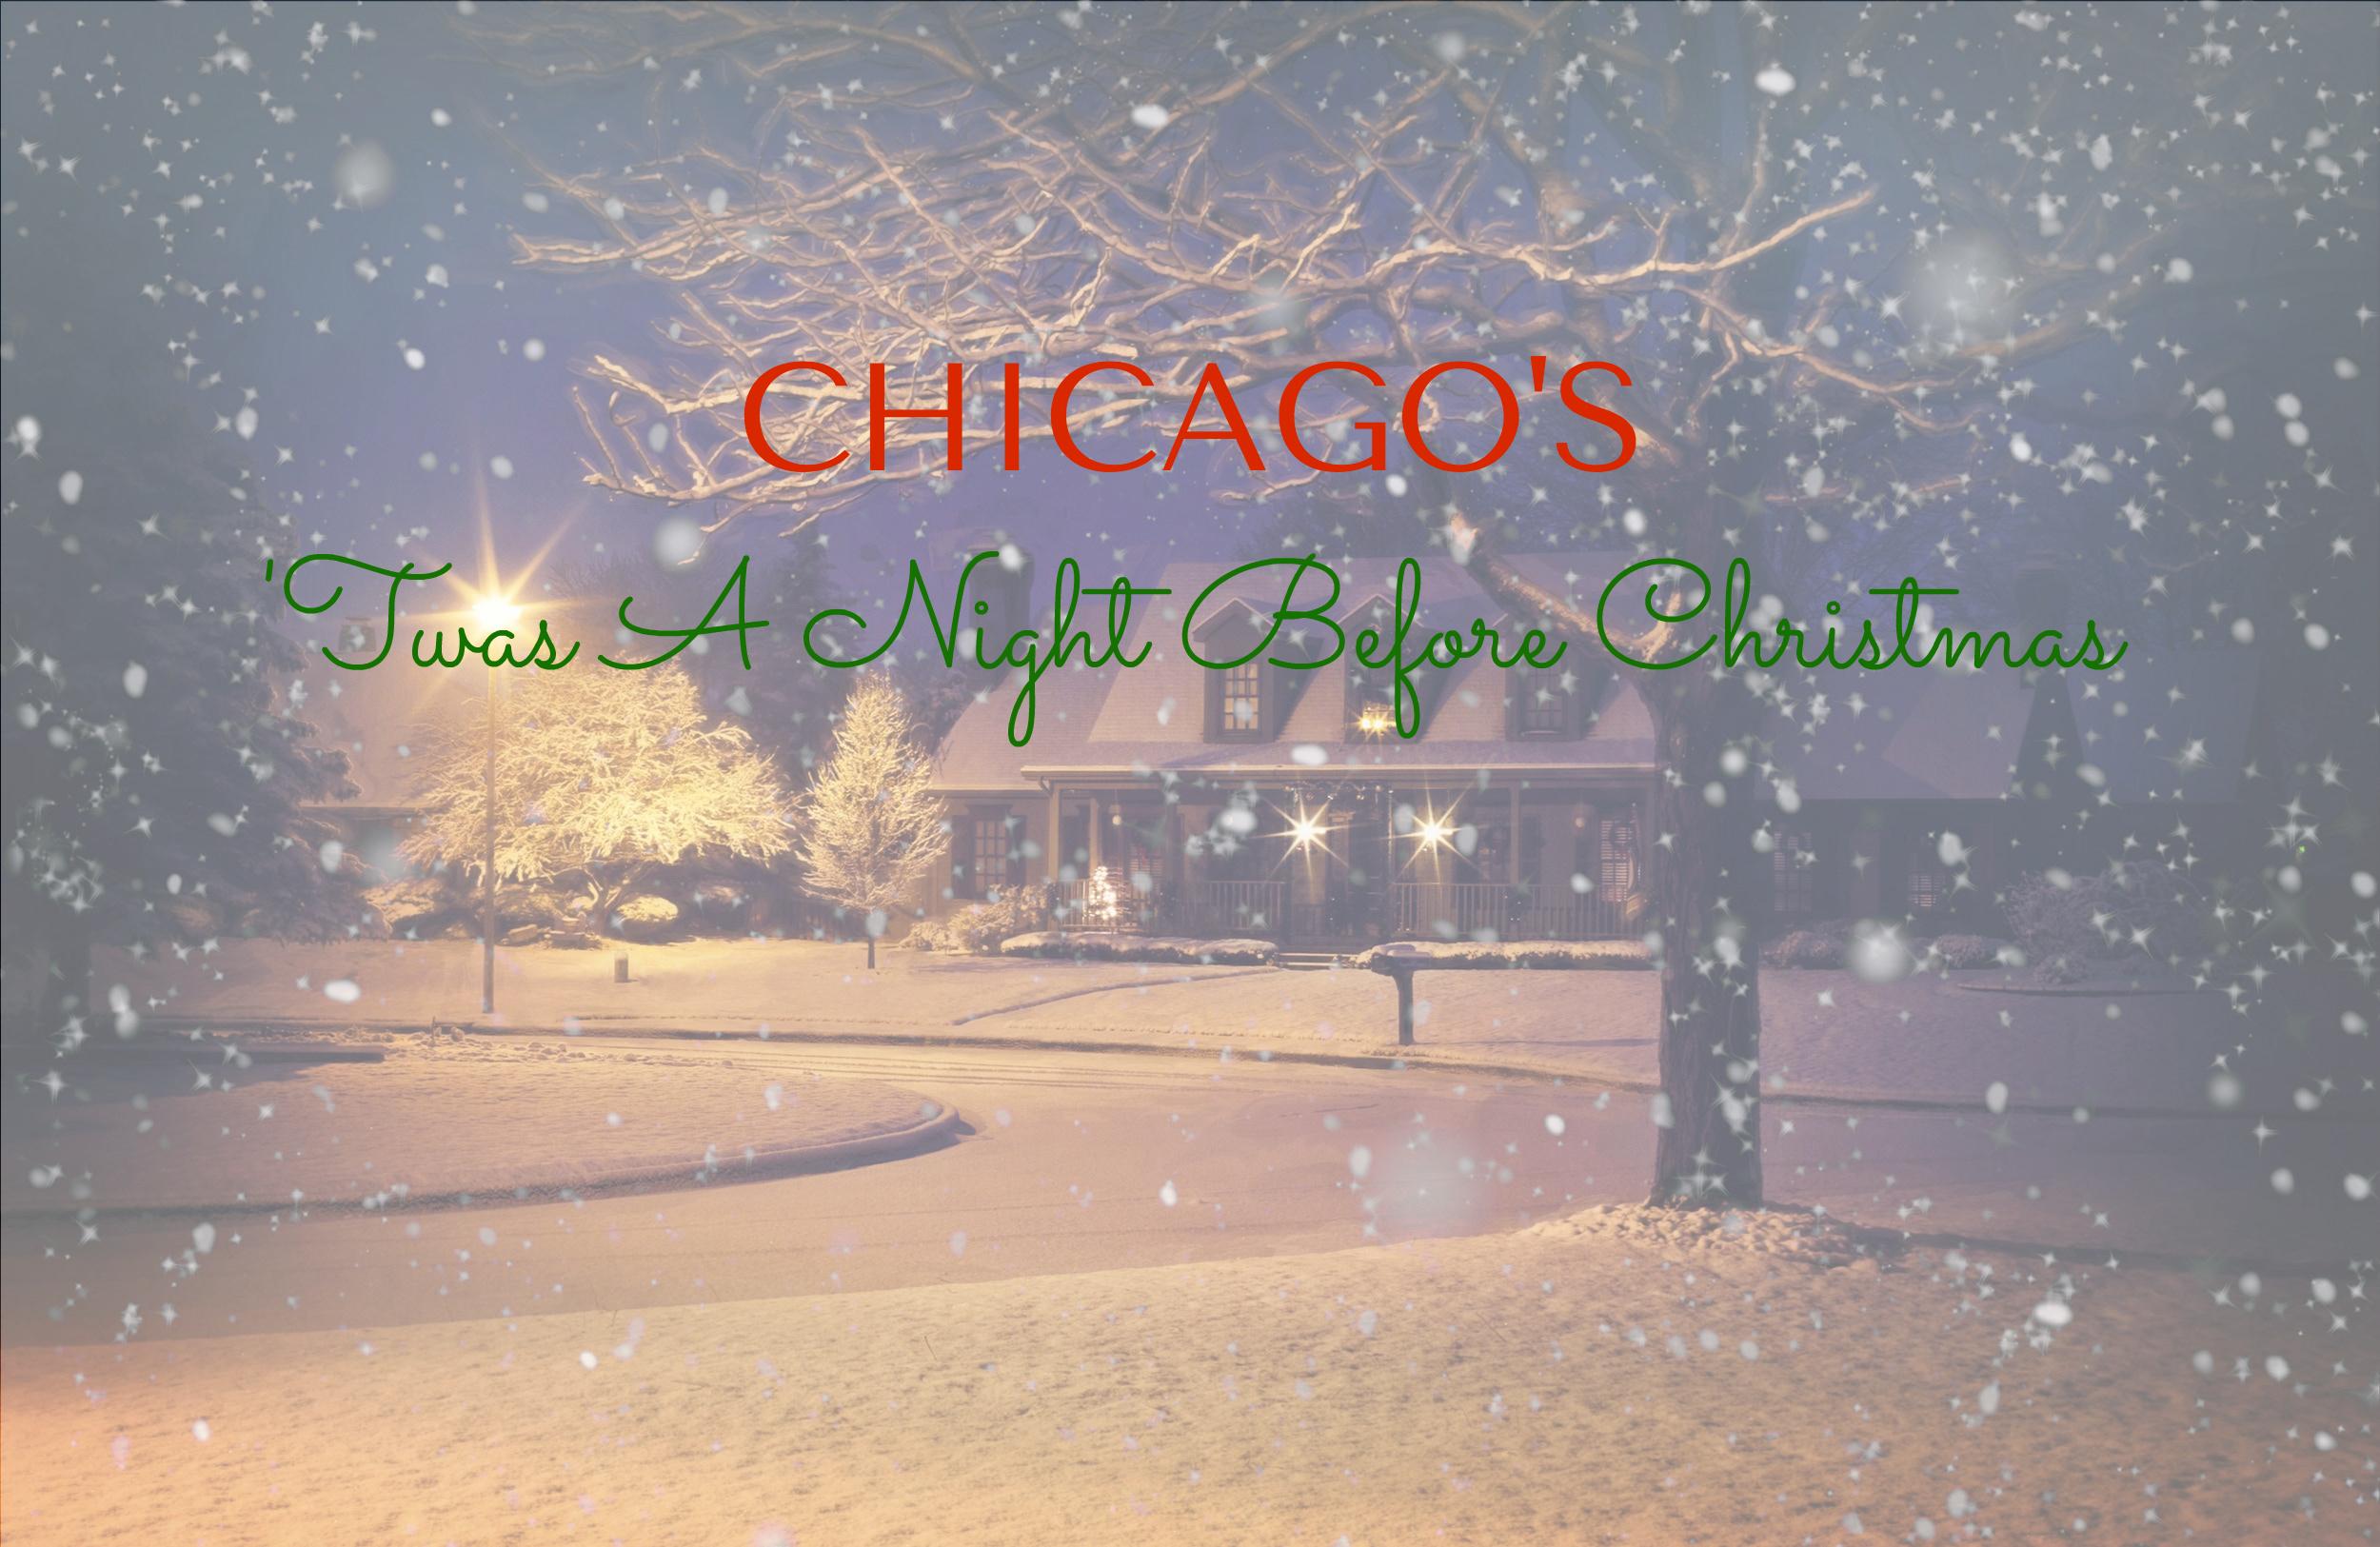 chicagos-twas-night-before-christmas.jpg